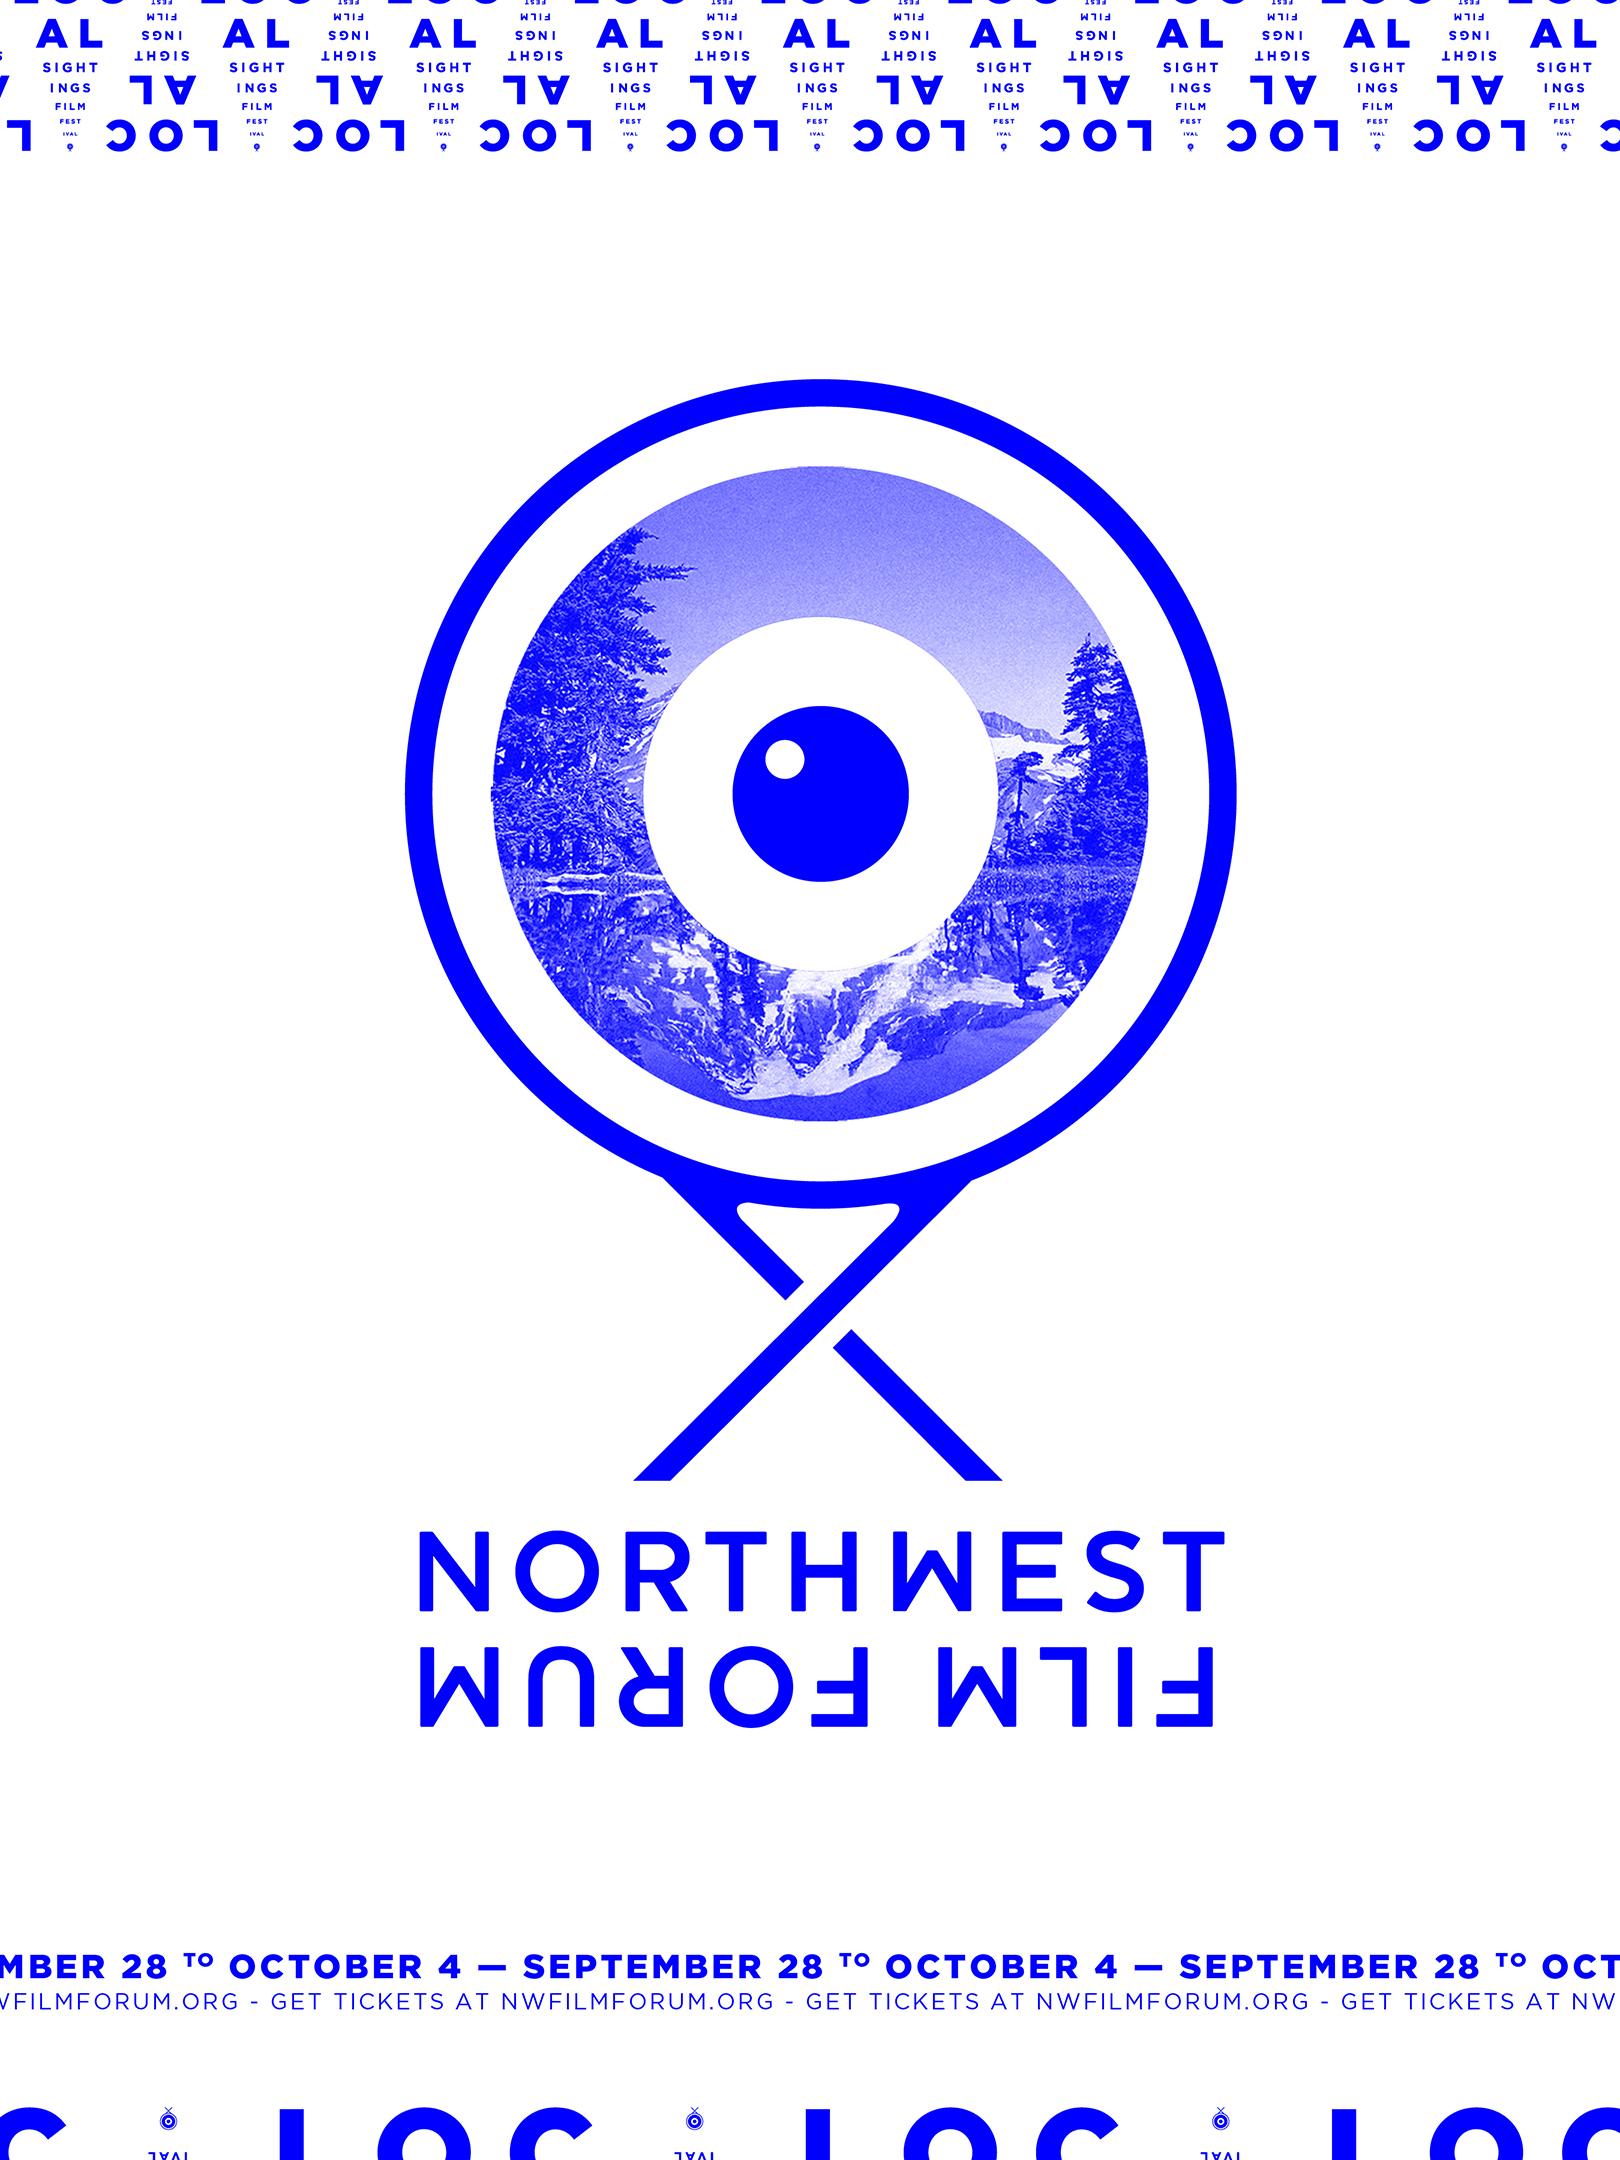 NWFF_LS_poster_WILDPOST_logo.jpg